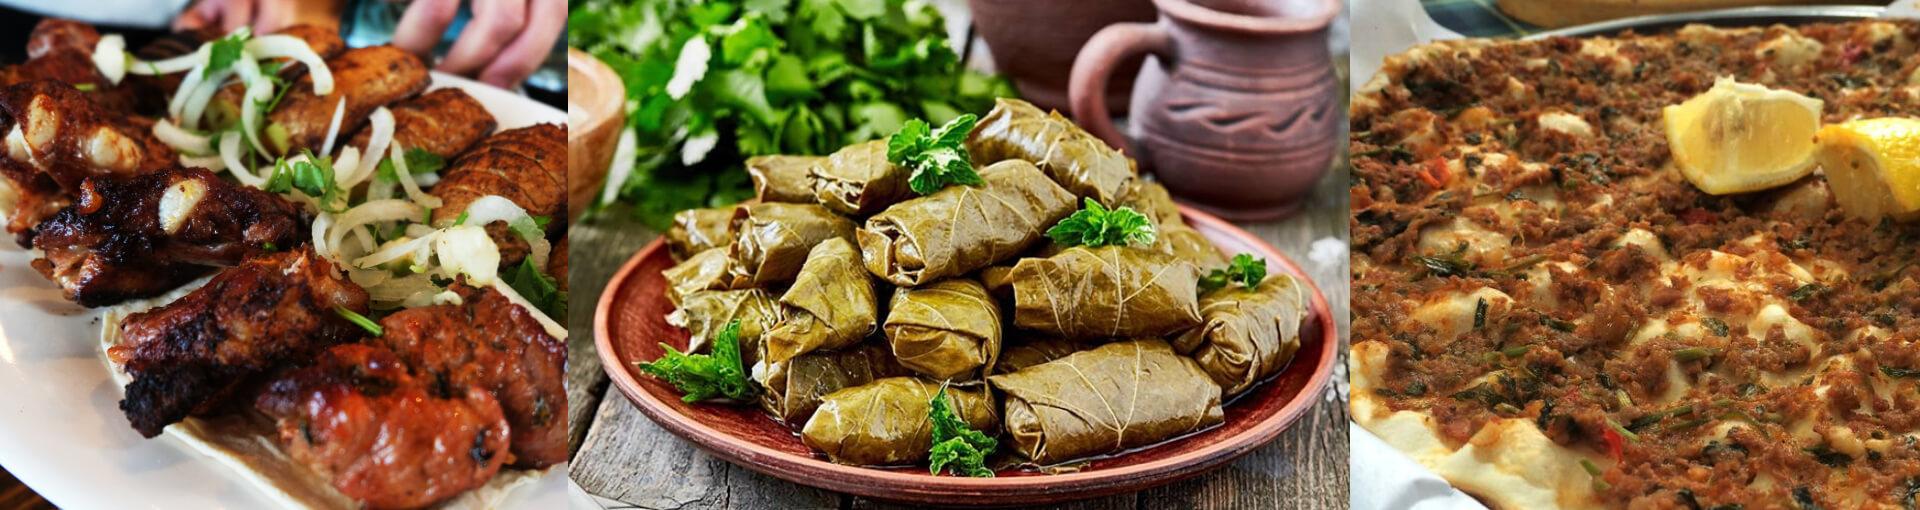 Main Dishes of Armenian Cuisine